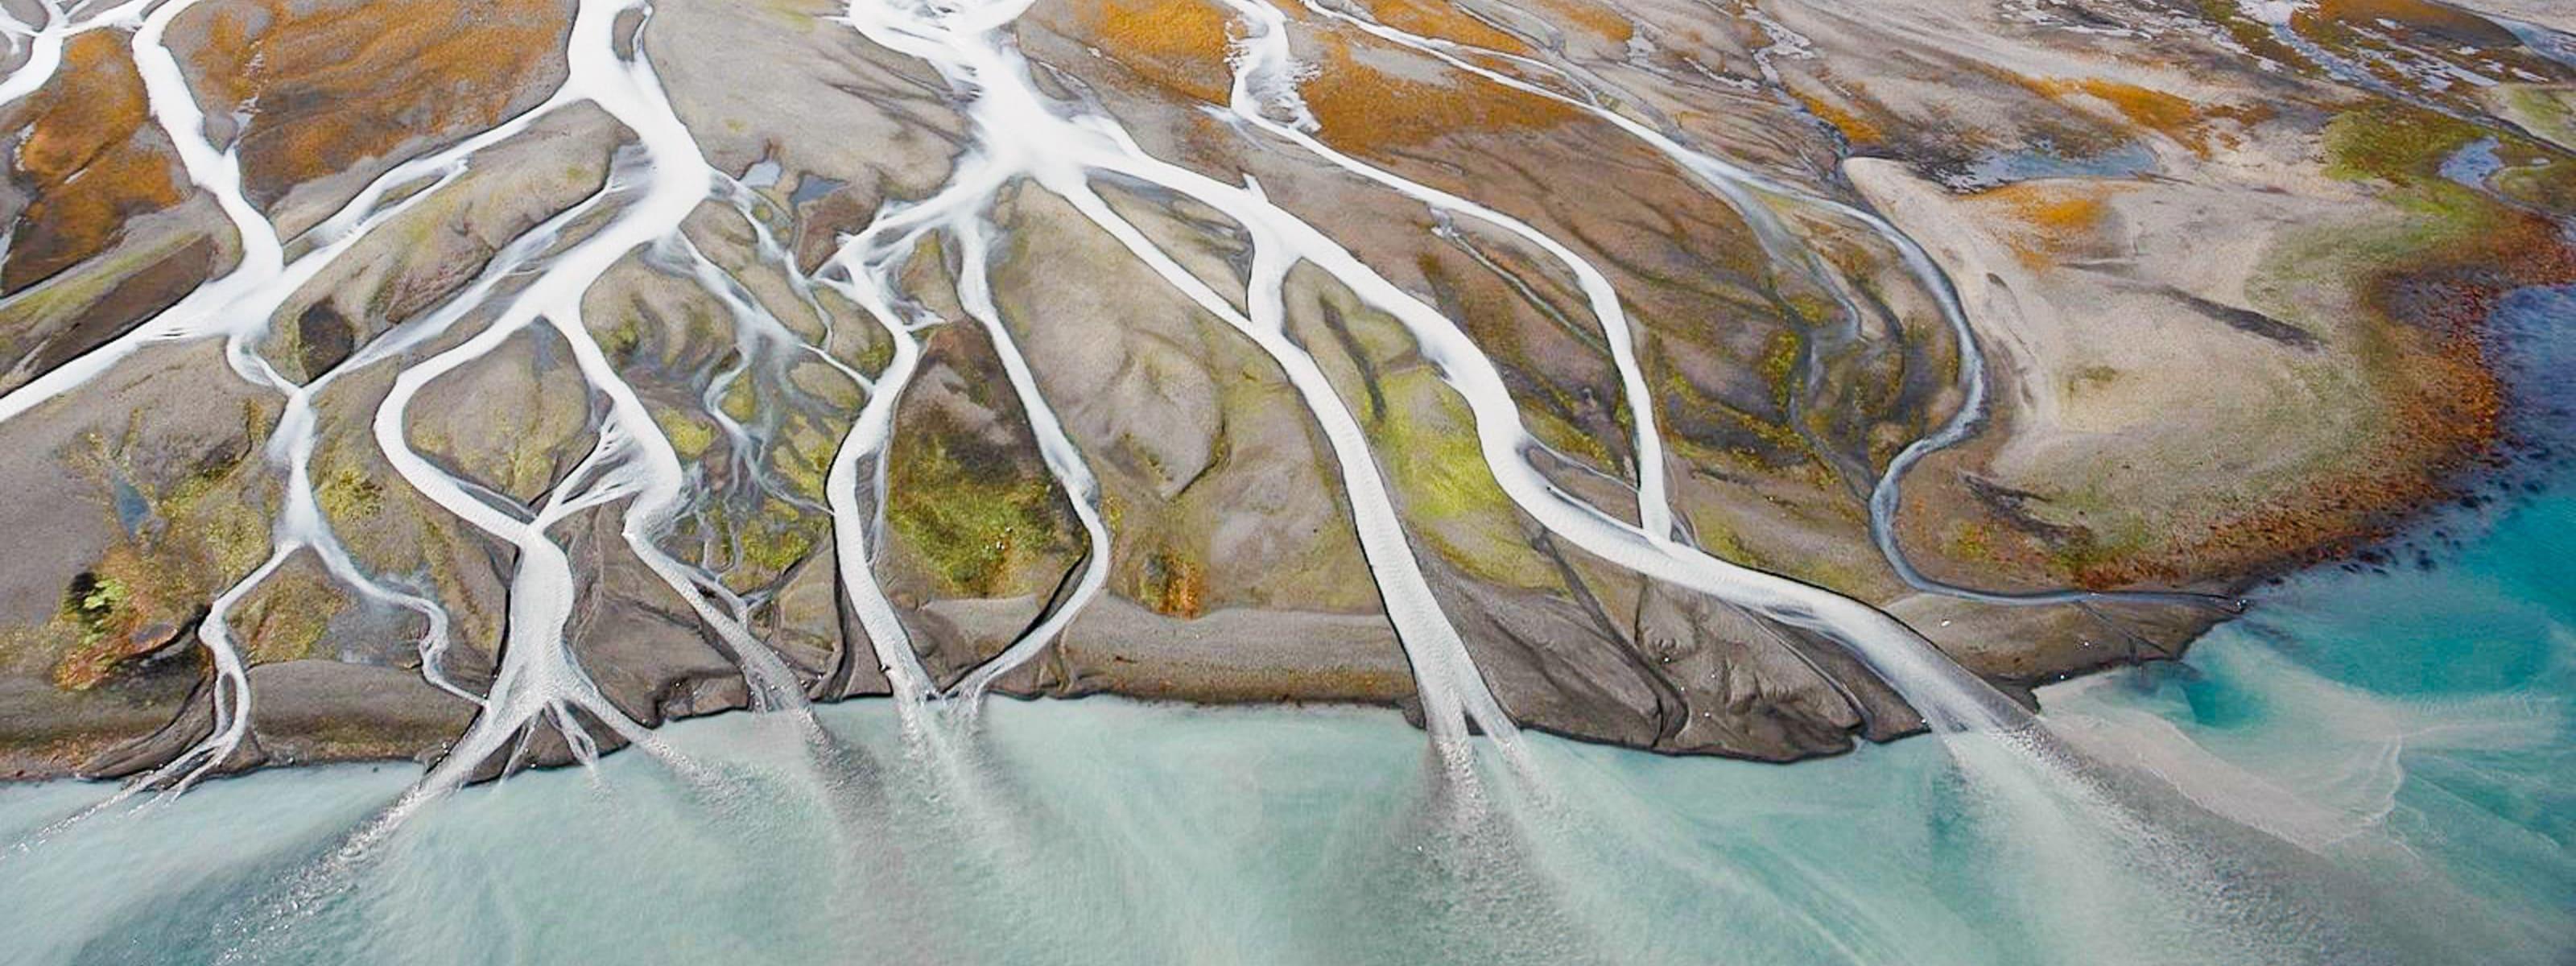 Braided river from Alaska